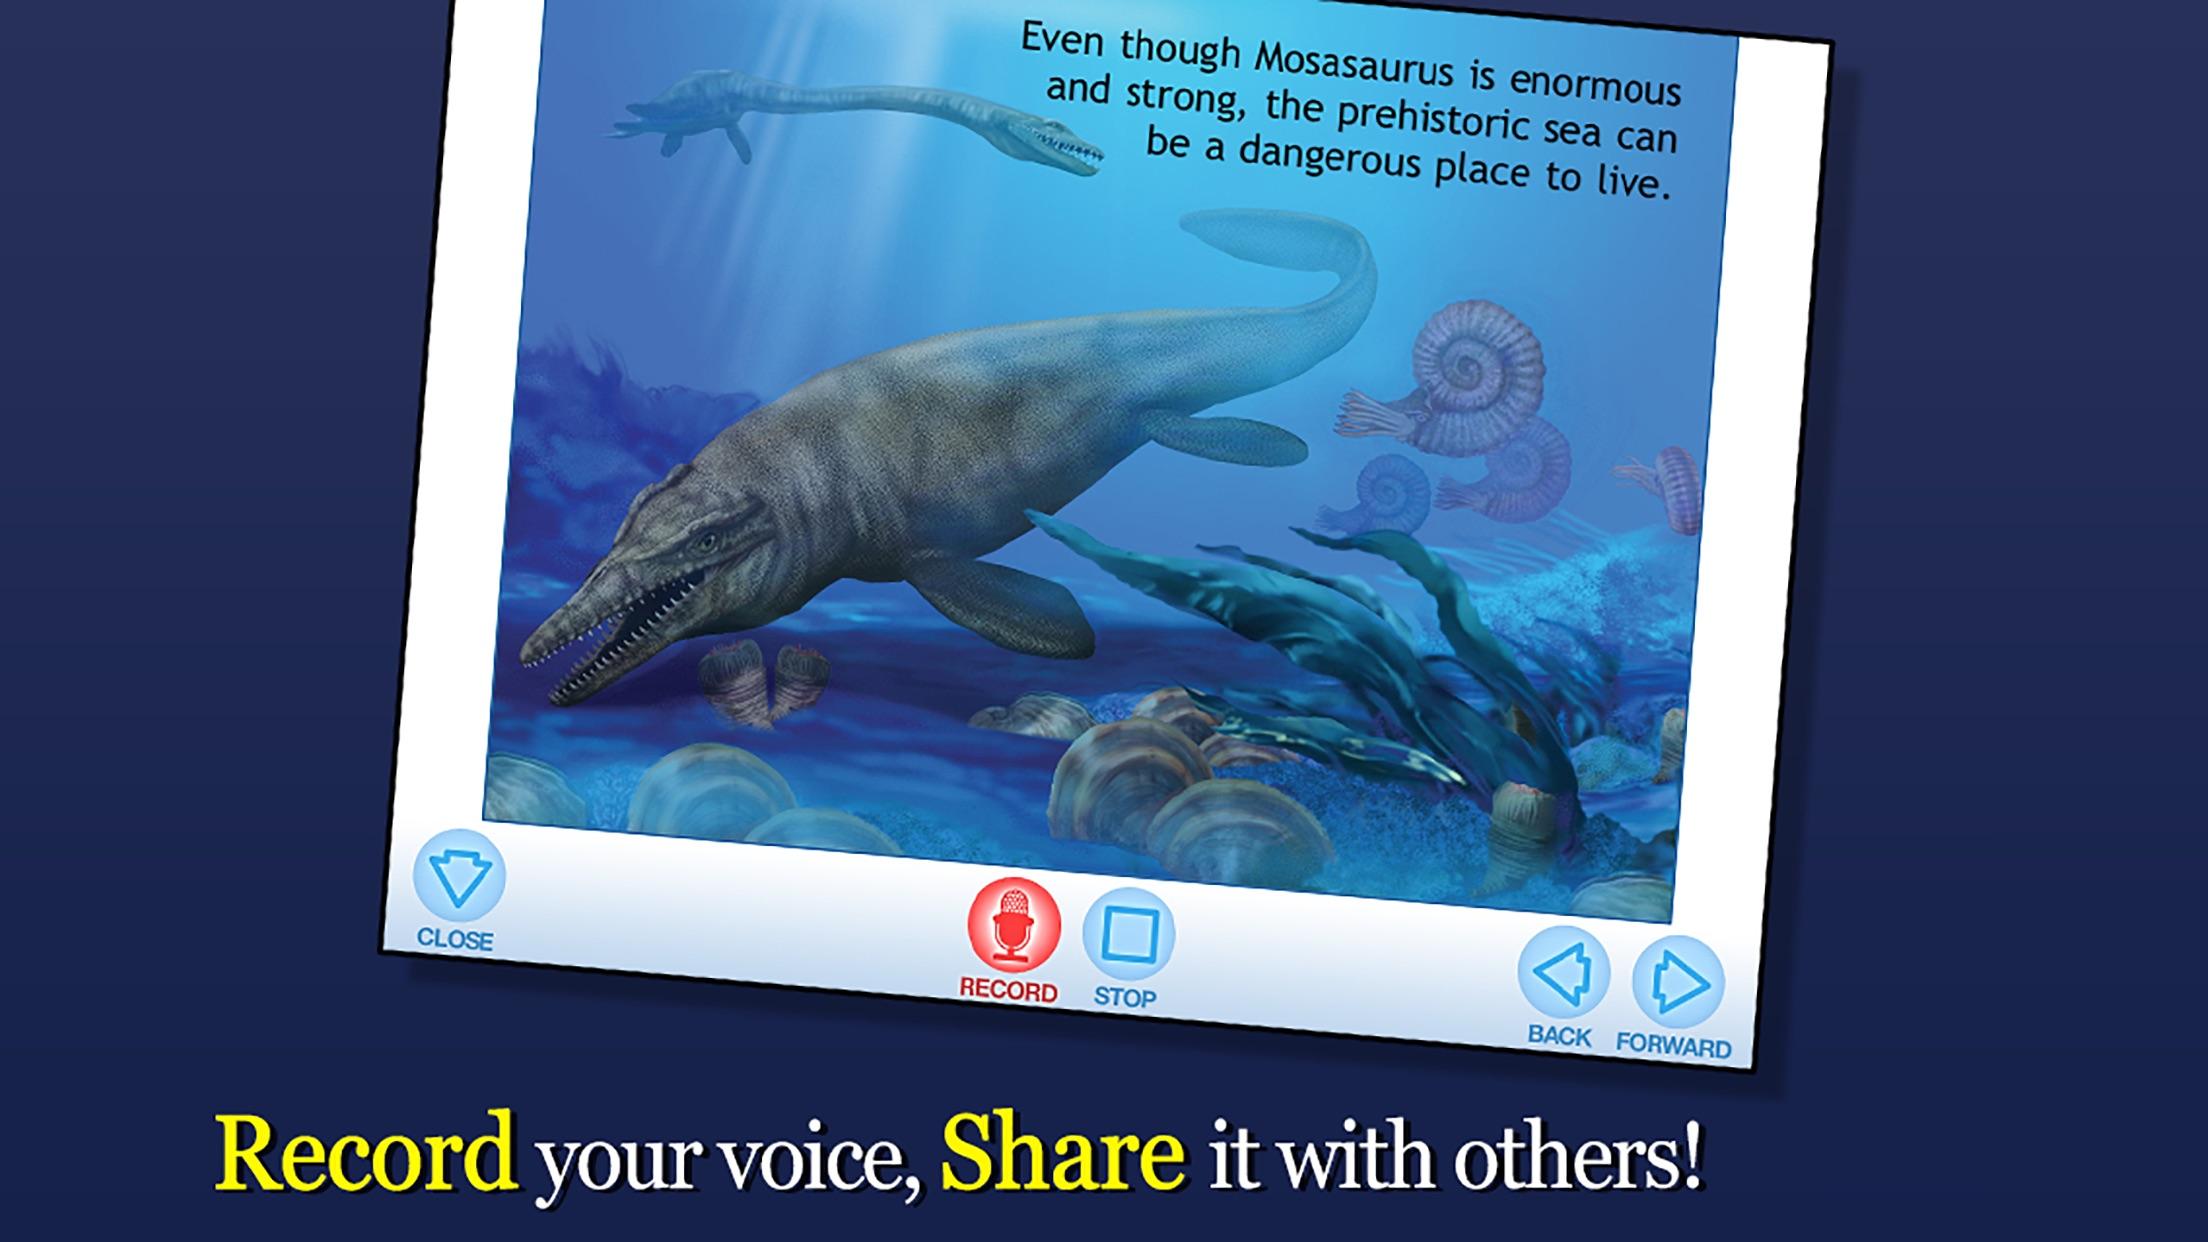 Mosasaurus: Mighty Ruler of the Sea - Smithsonian Screenshot